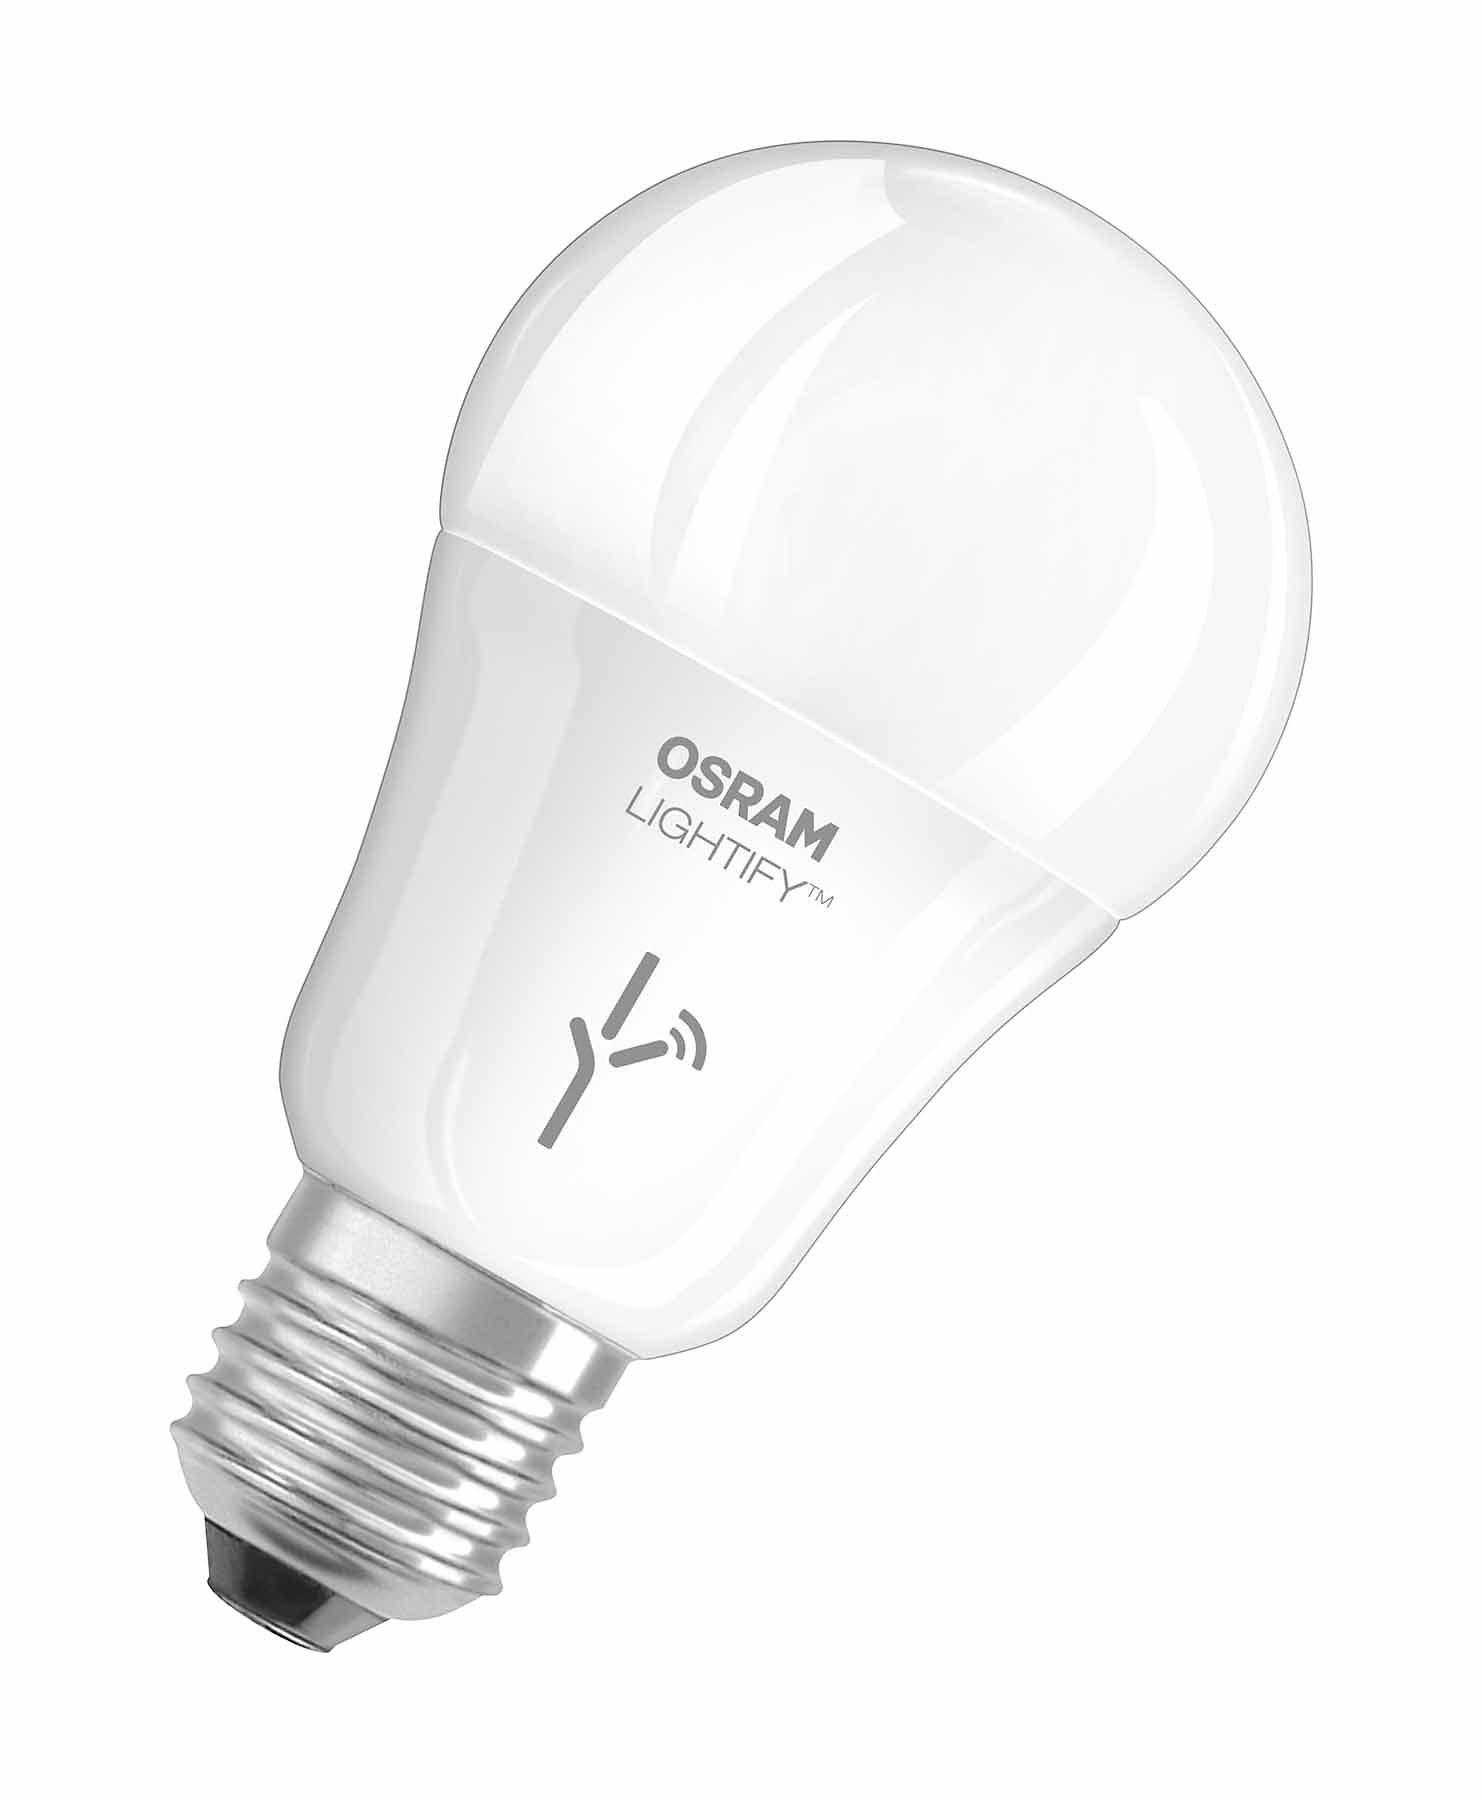 Osram Lightify - Smart Home - Licht »CLA 60 / 10W LED-Glühlampe«